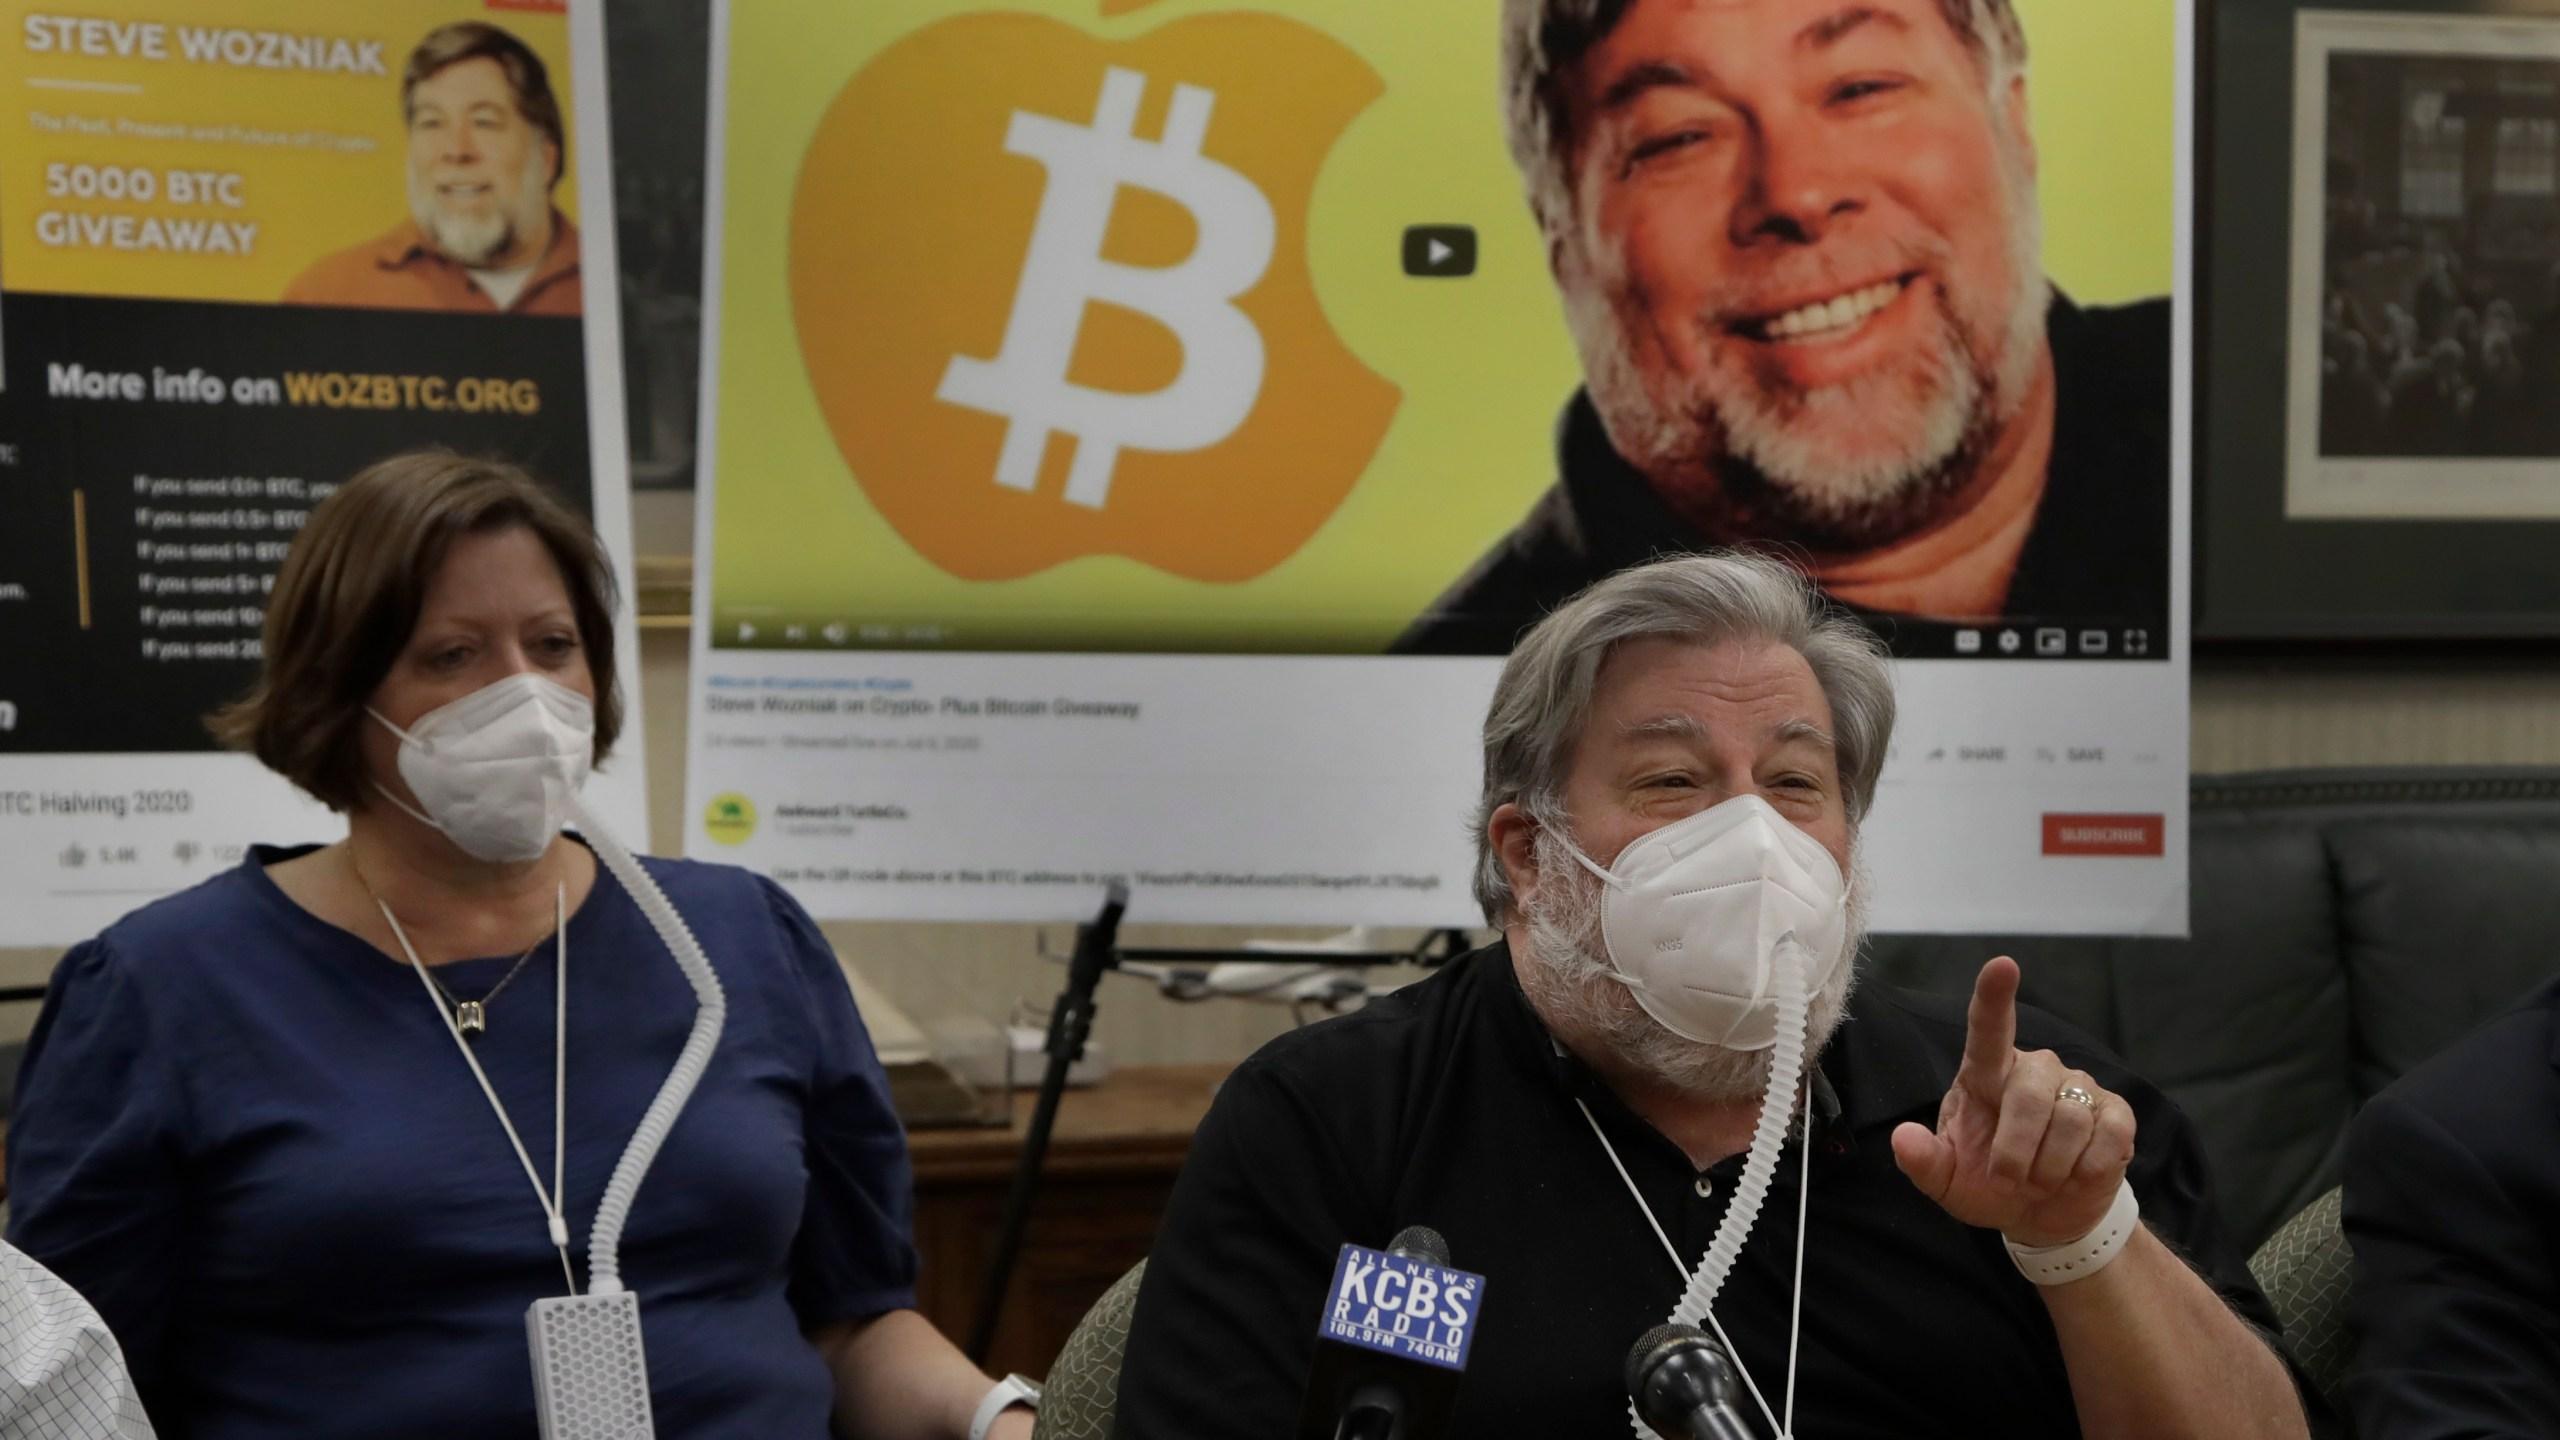 Steve Wozniak, Janet Hill